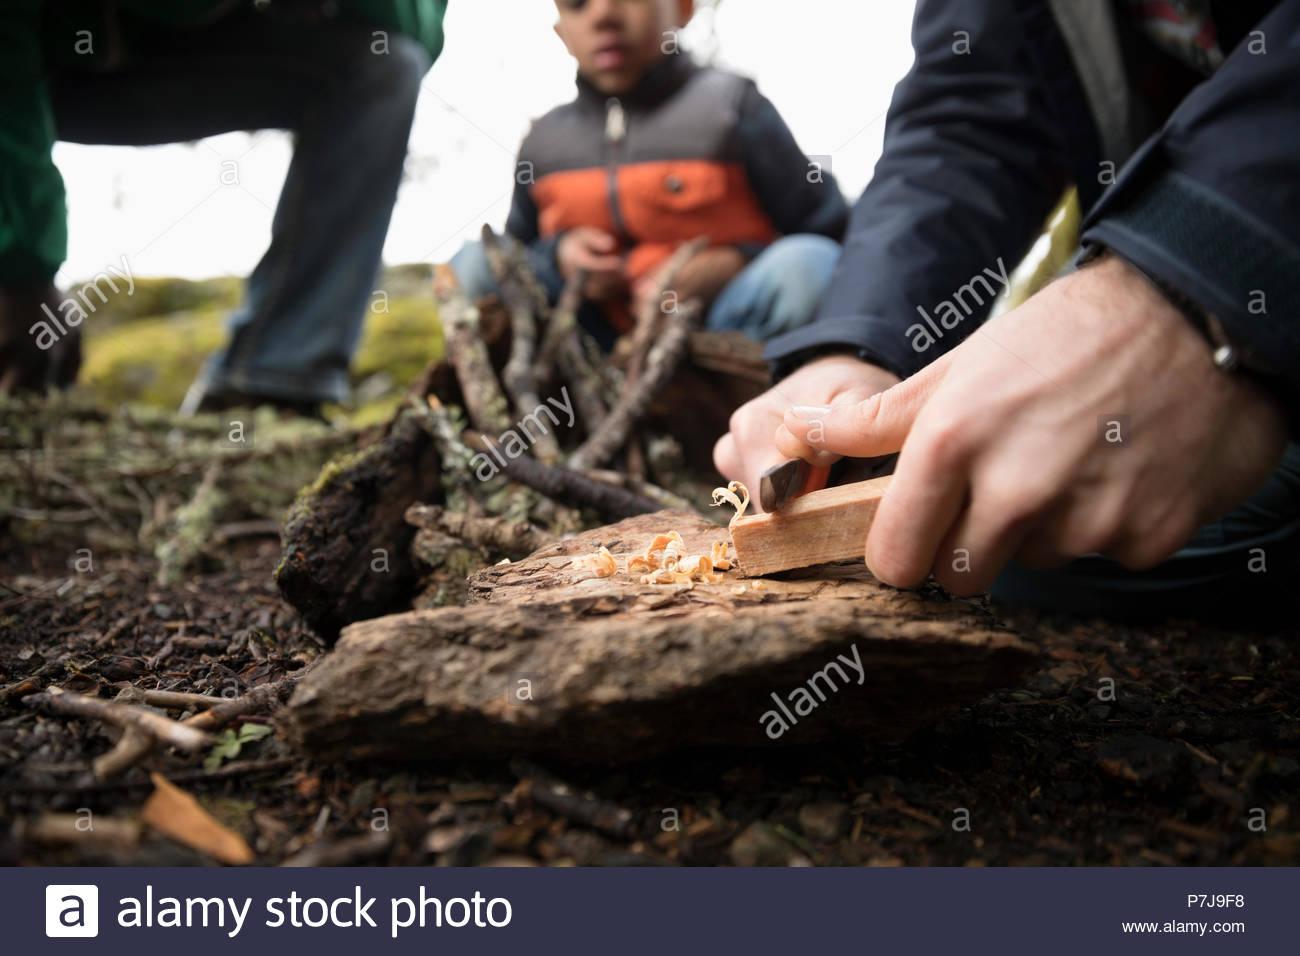 Man preparing campfire in woods - Stock Image